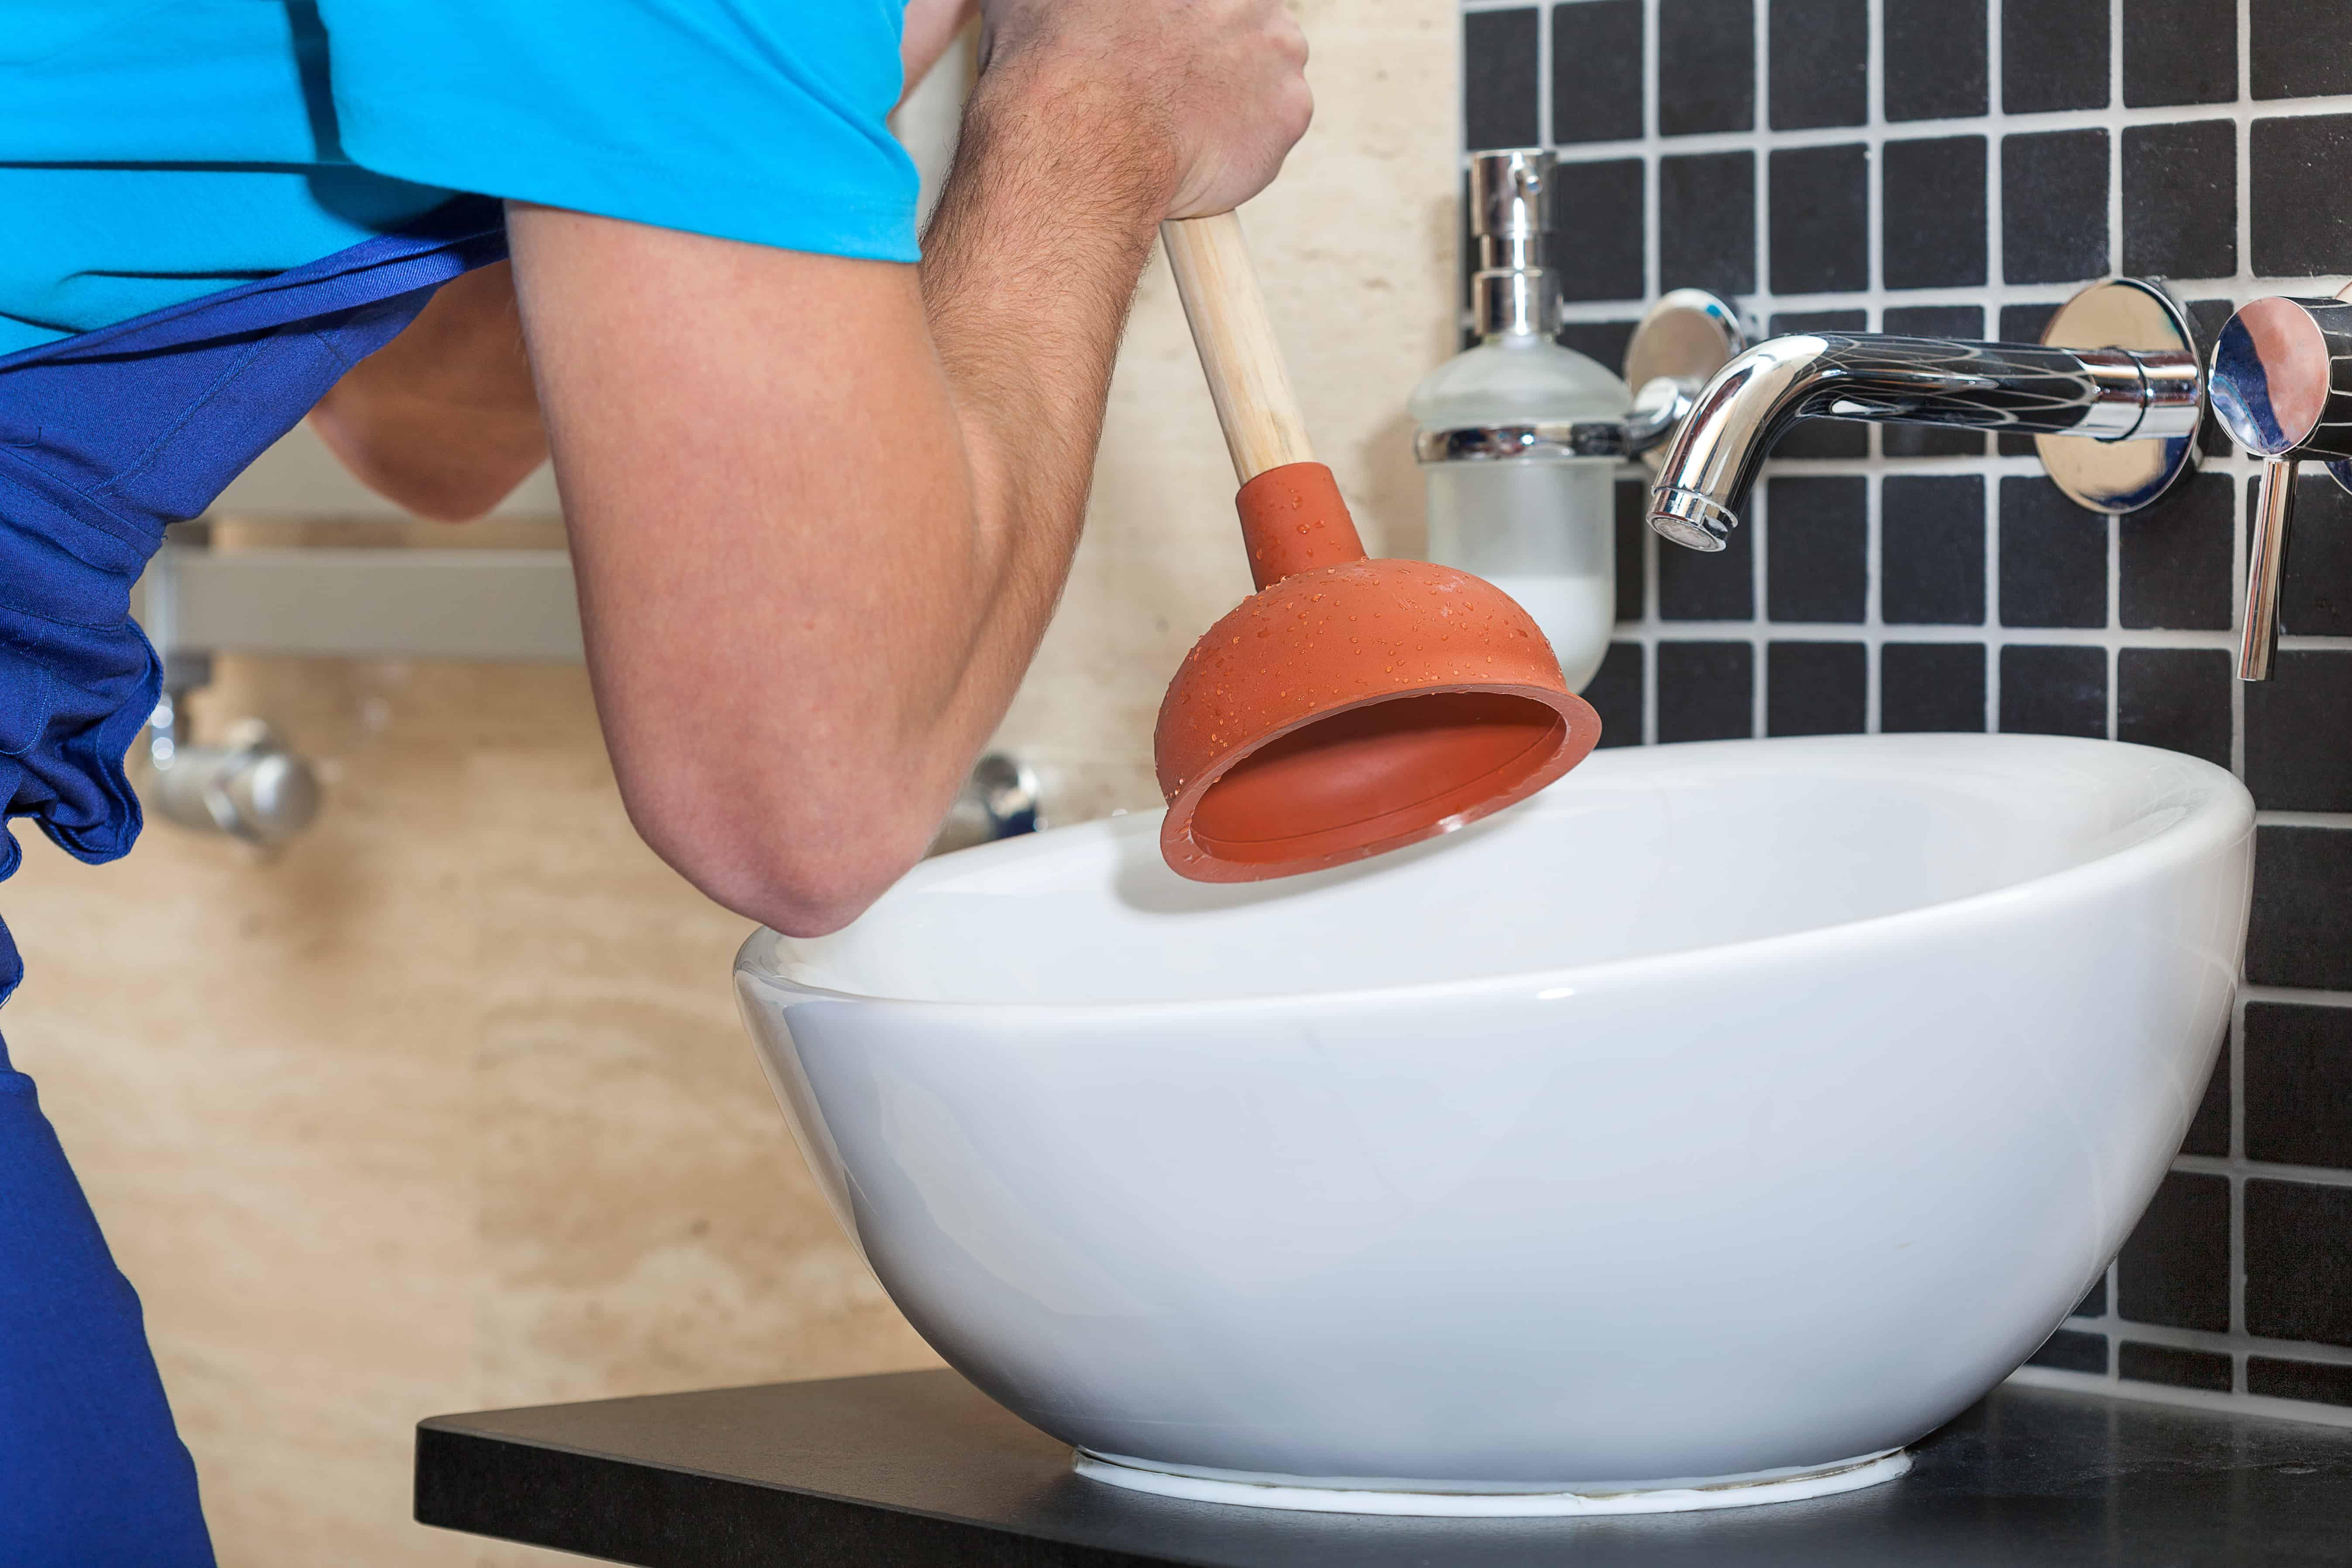 Abfluss verstopft: Effiziente Reinigung des Abflusses